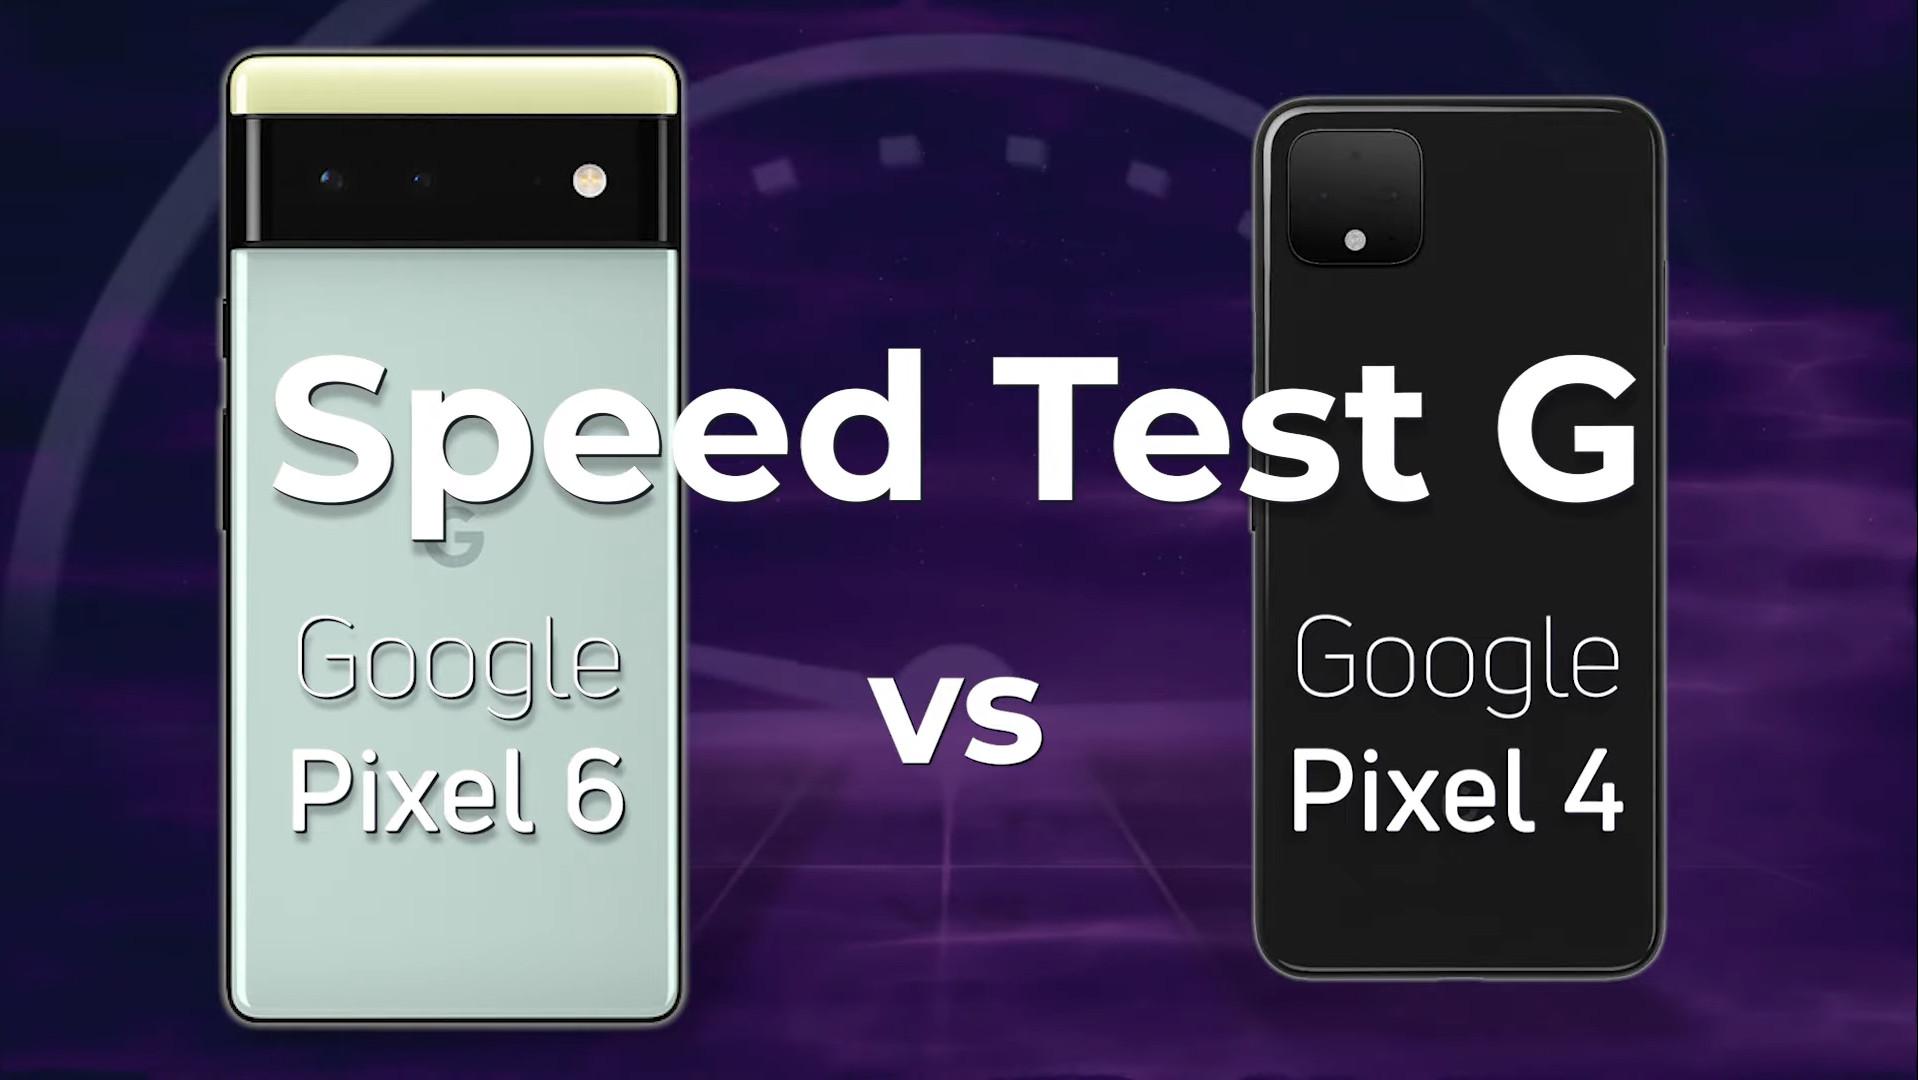 Speed Test G Pixel 6 vs Pixel 4